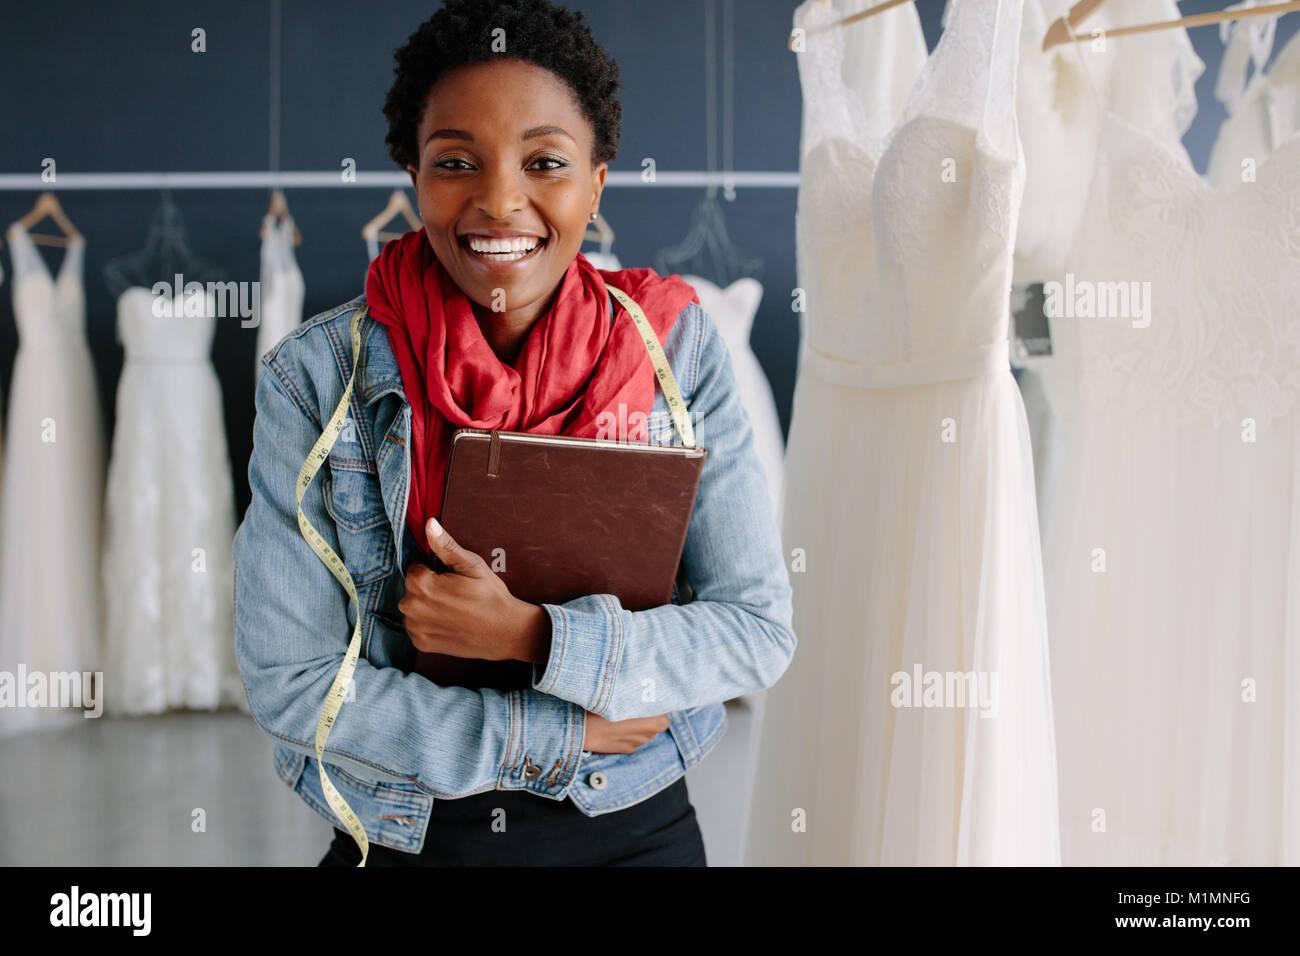 Cheerful bridal store owner standing dans sa boutique avec un journal intime. Mariage femme Fashion designer dans Photo Stock